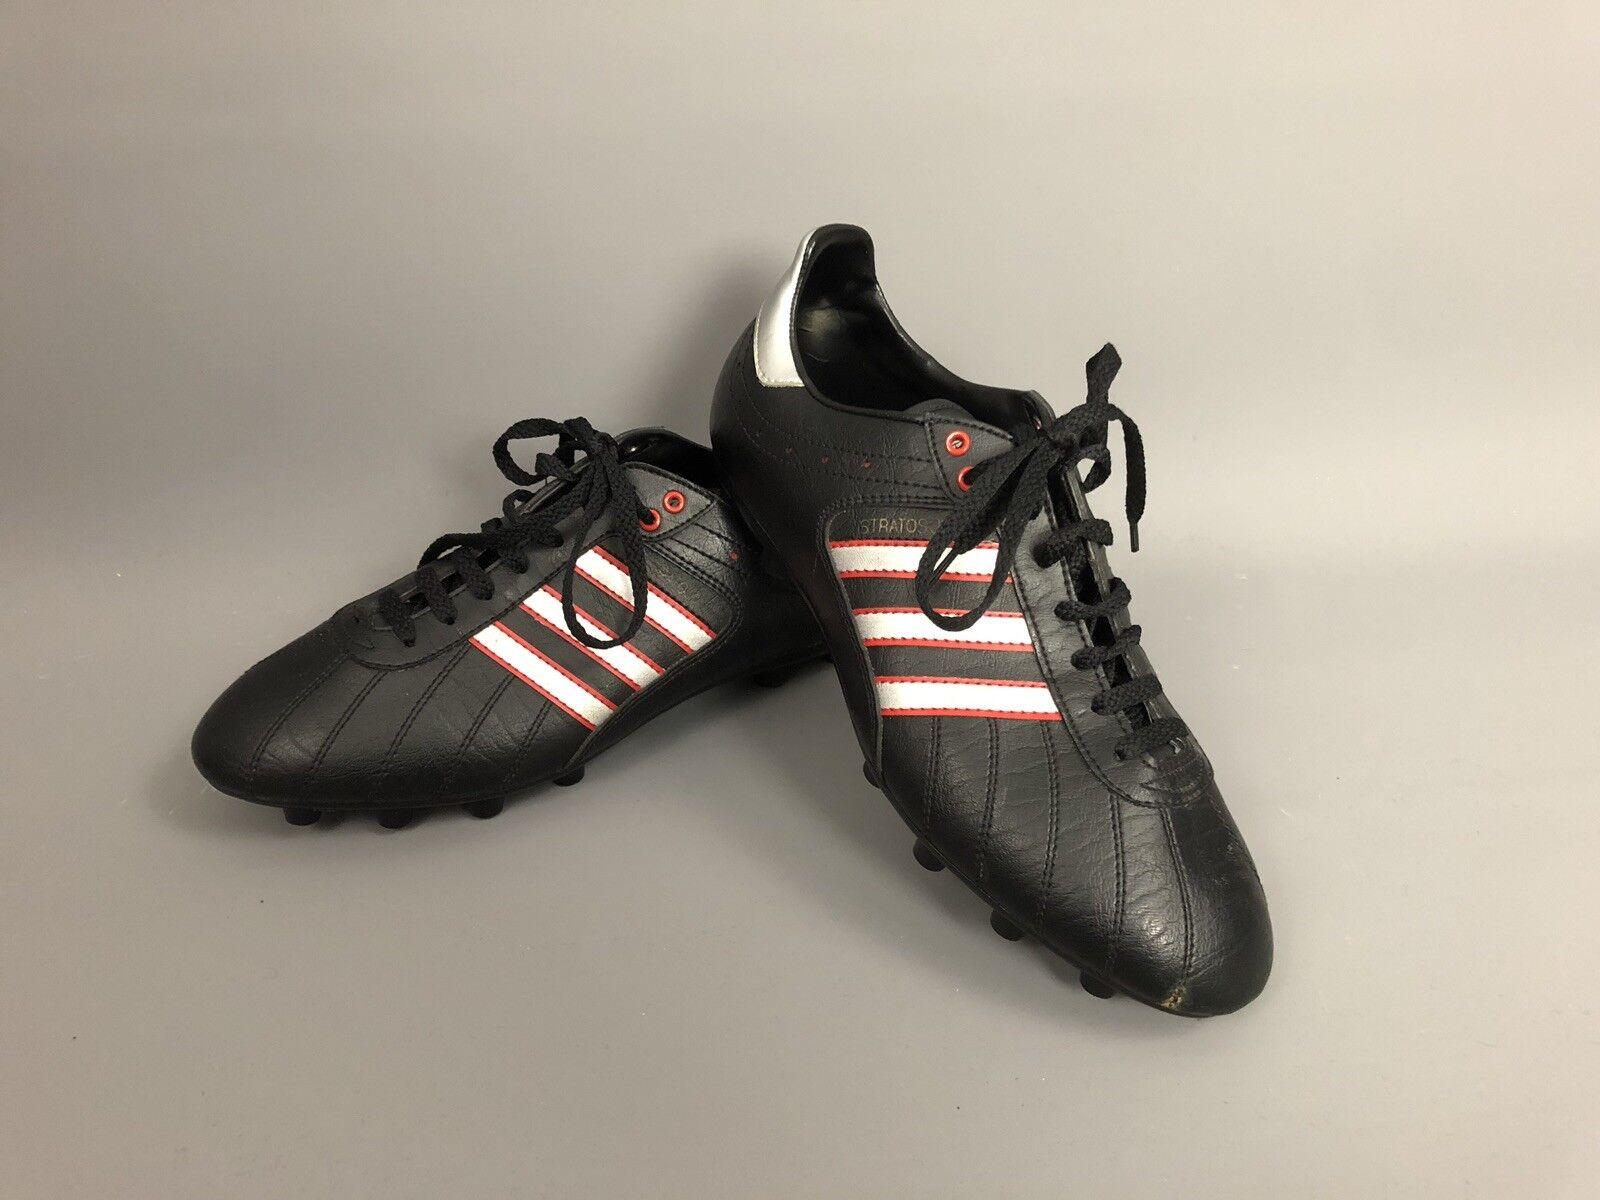 ADIDAS STRATOS JL Retro Football bottes - Taille UK9 - Moulded Studs - nouveau